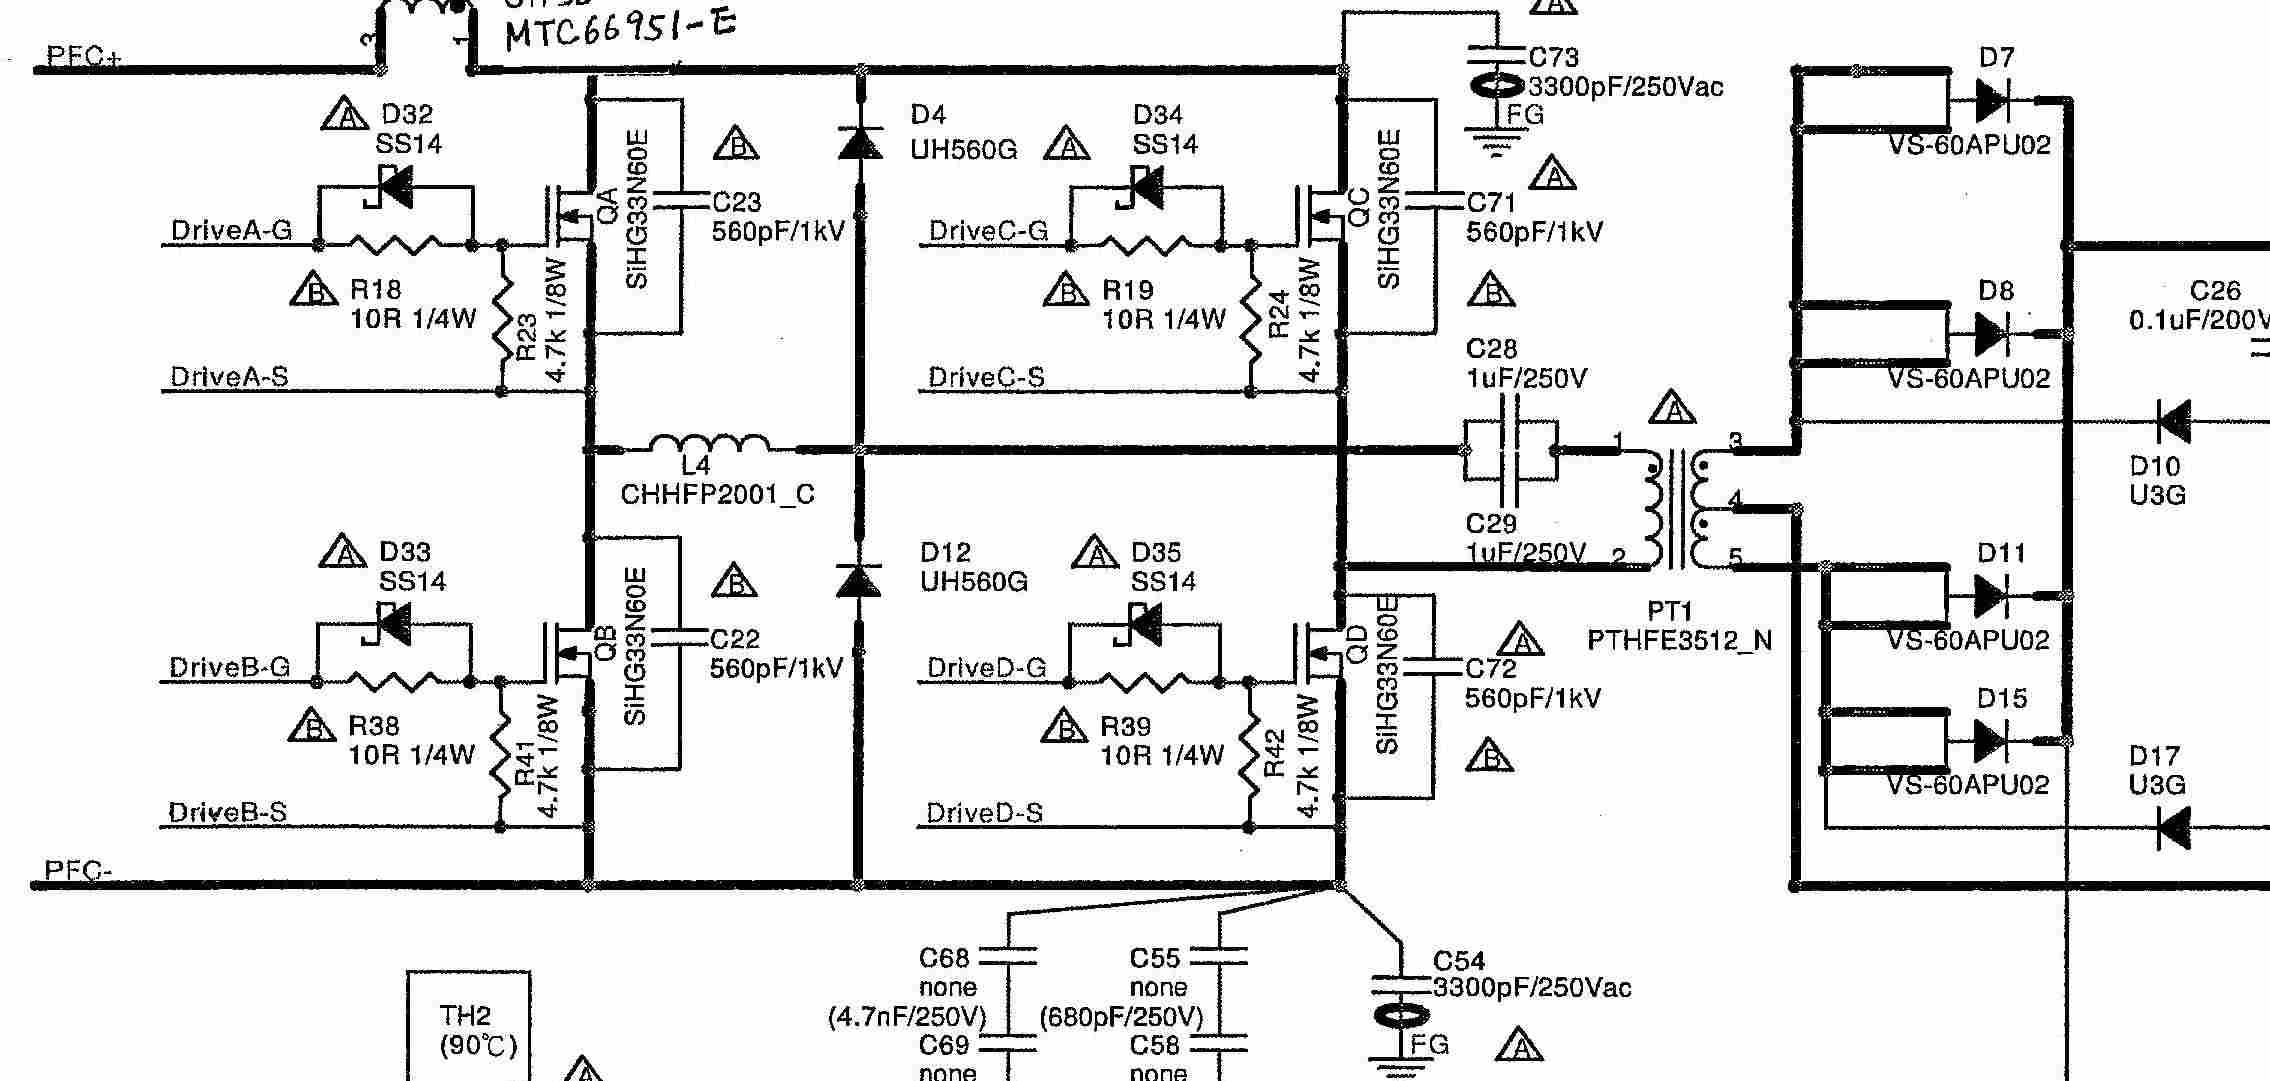 Ucc Ucc Circuit Diagram Confirmed